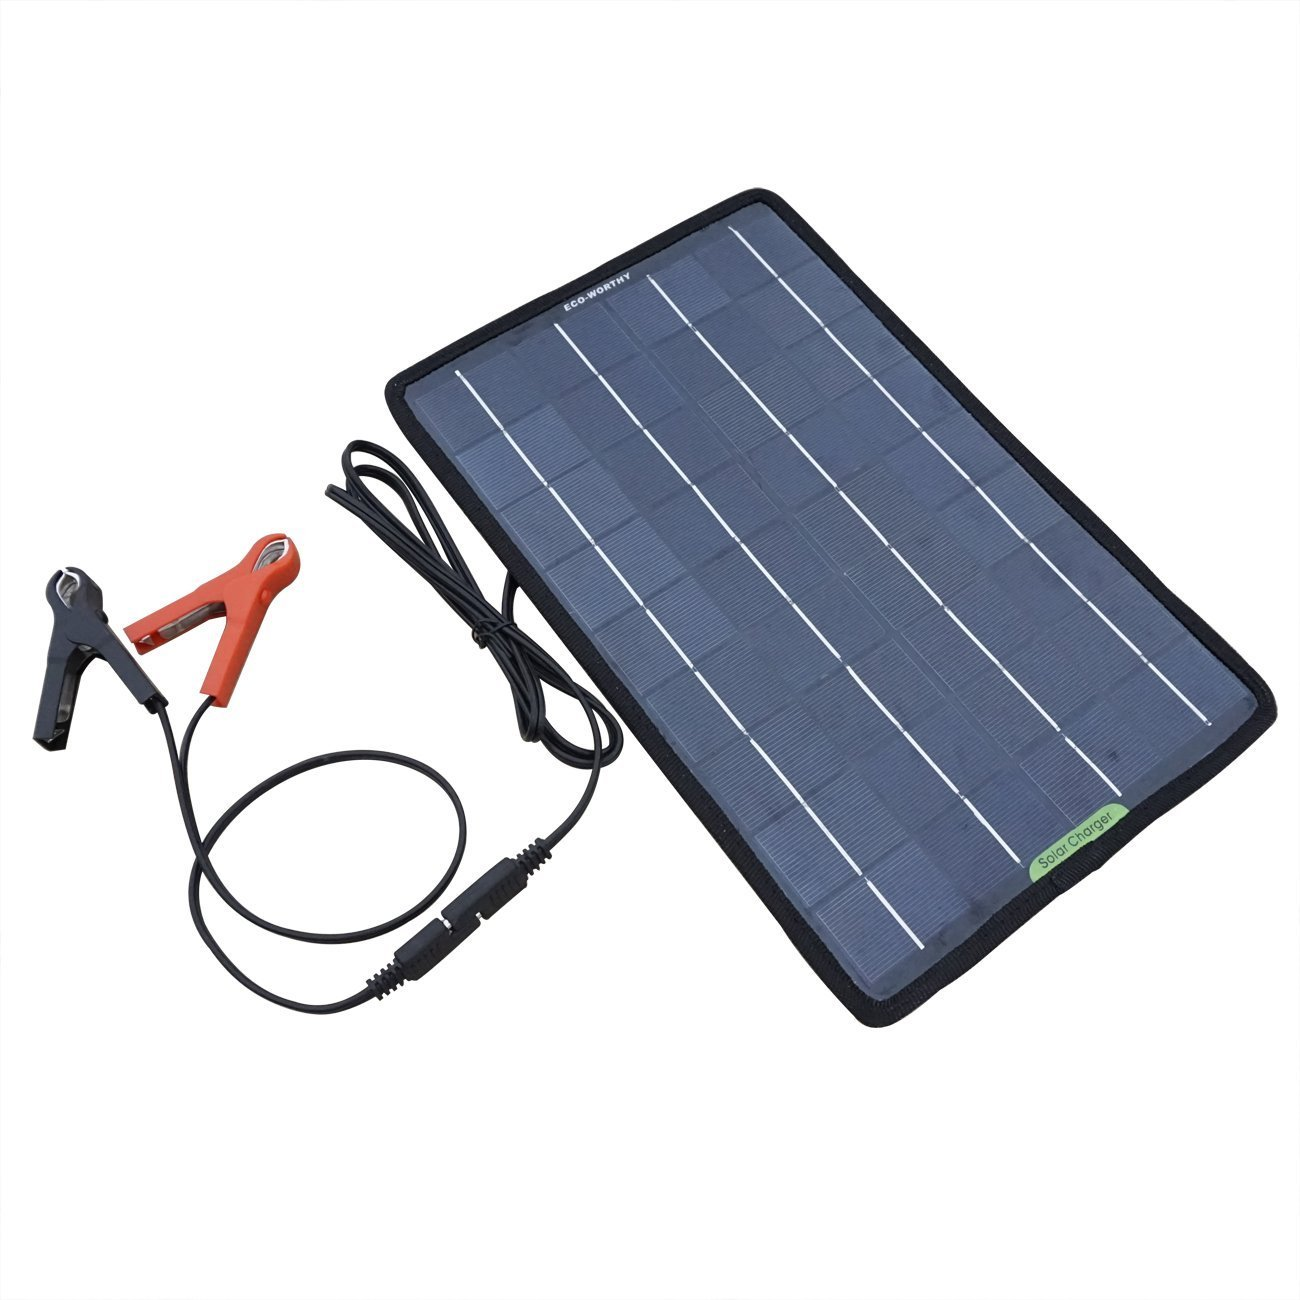 ECO-WORTHY 12V 10W ソーラーパネル コンパクト